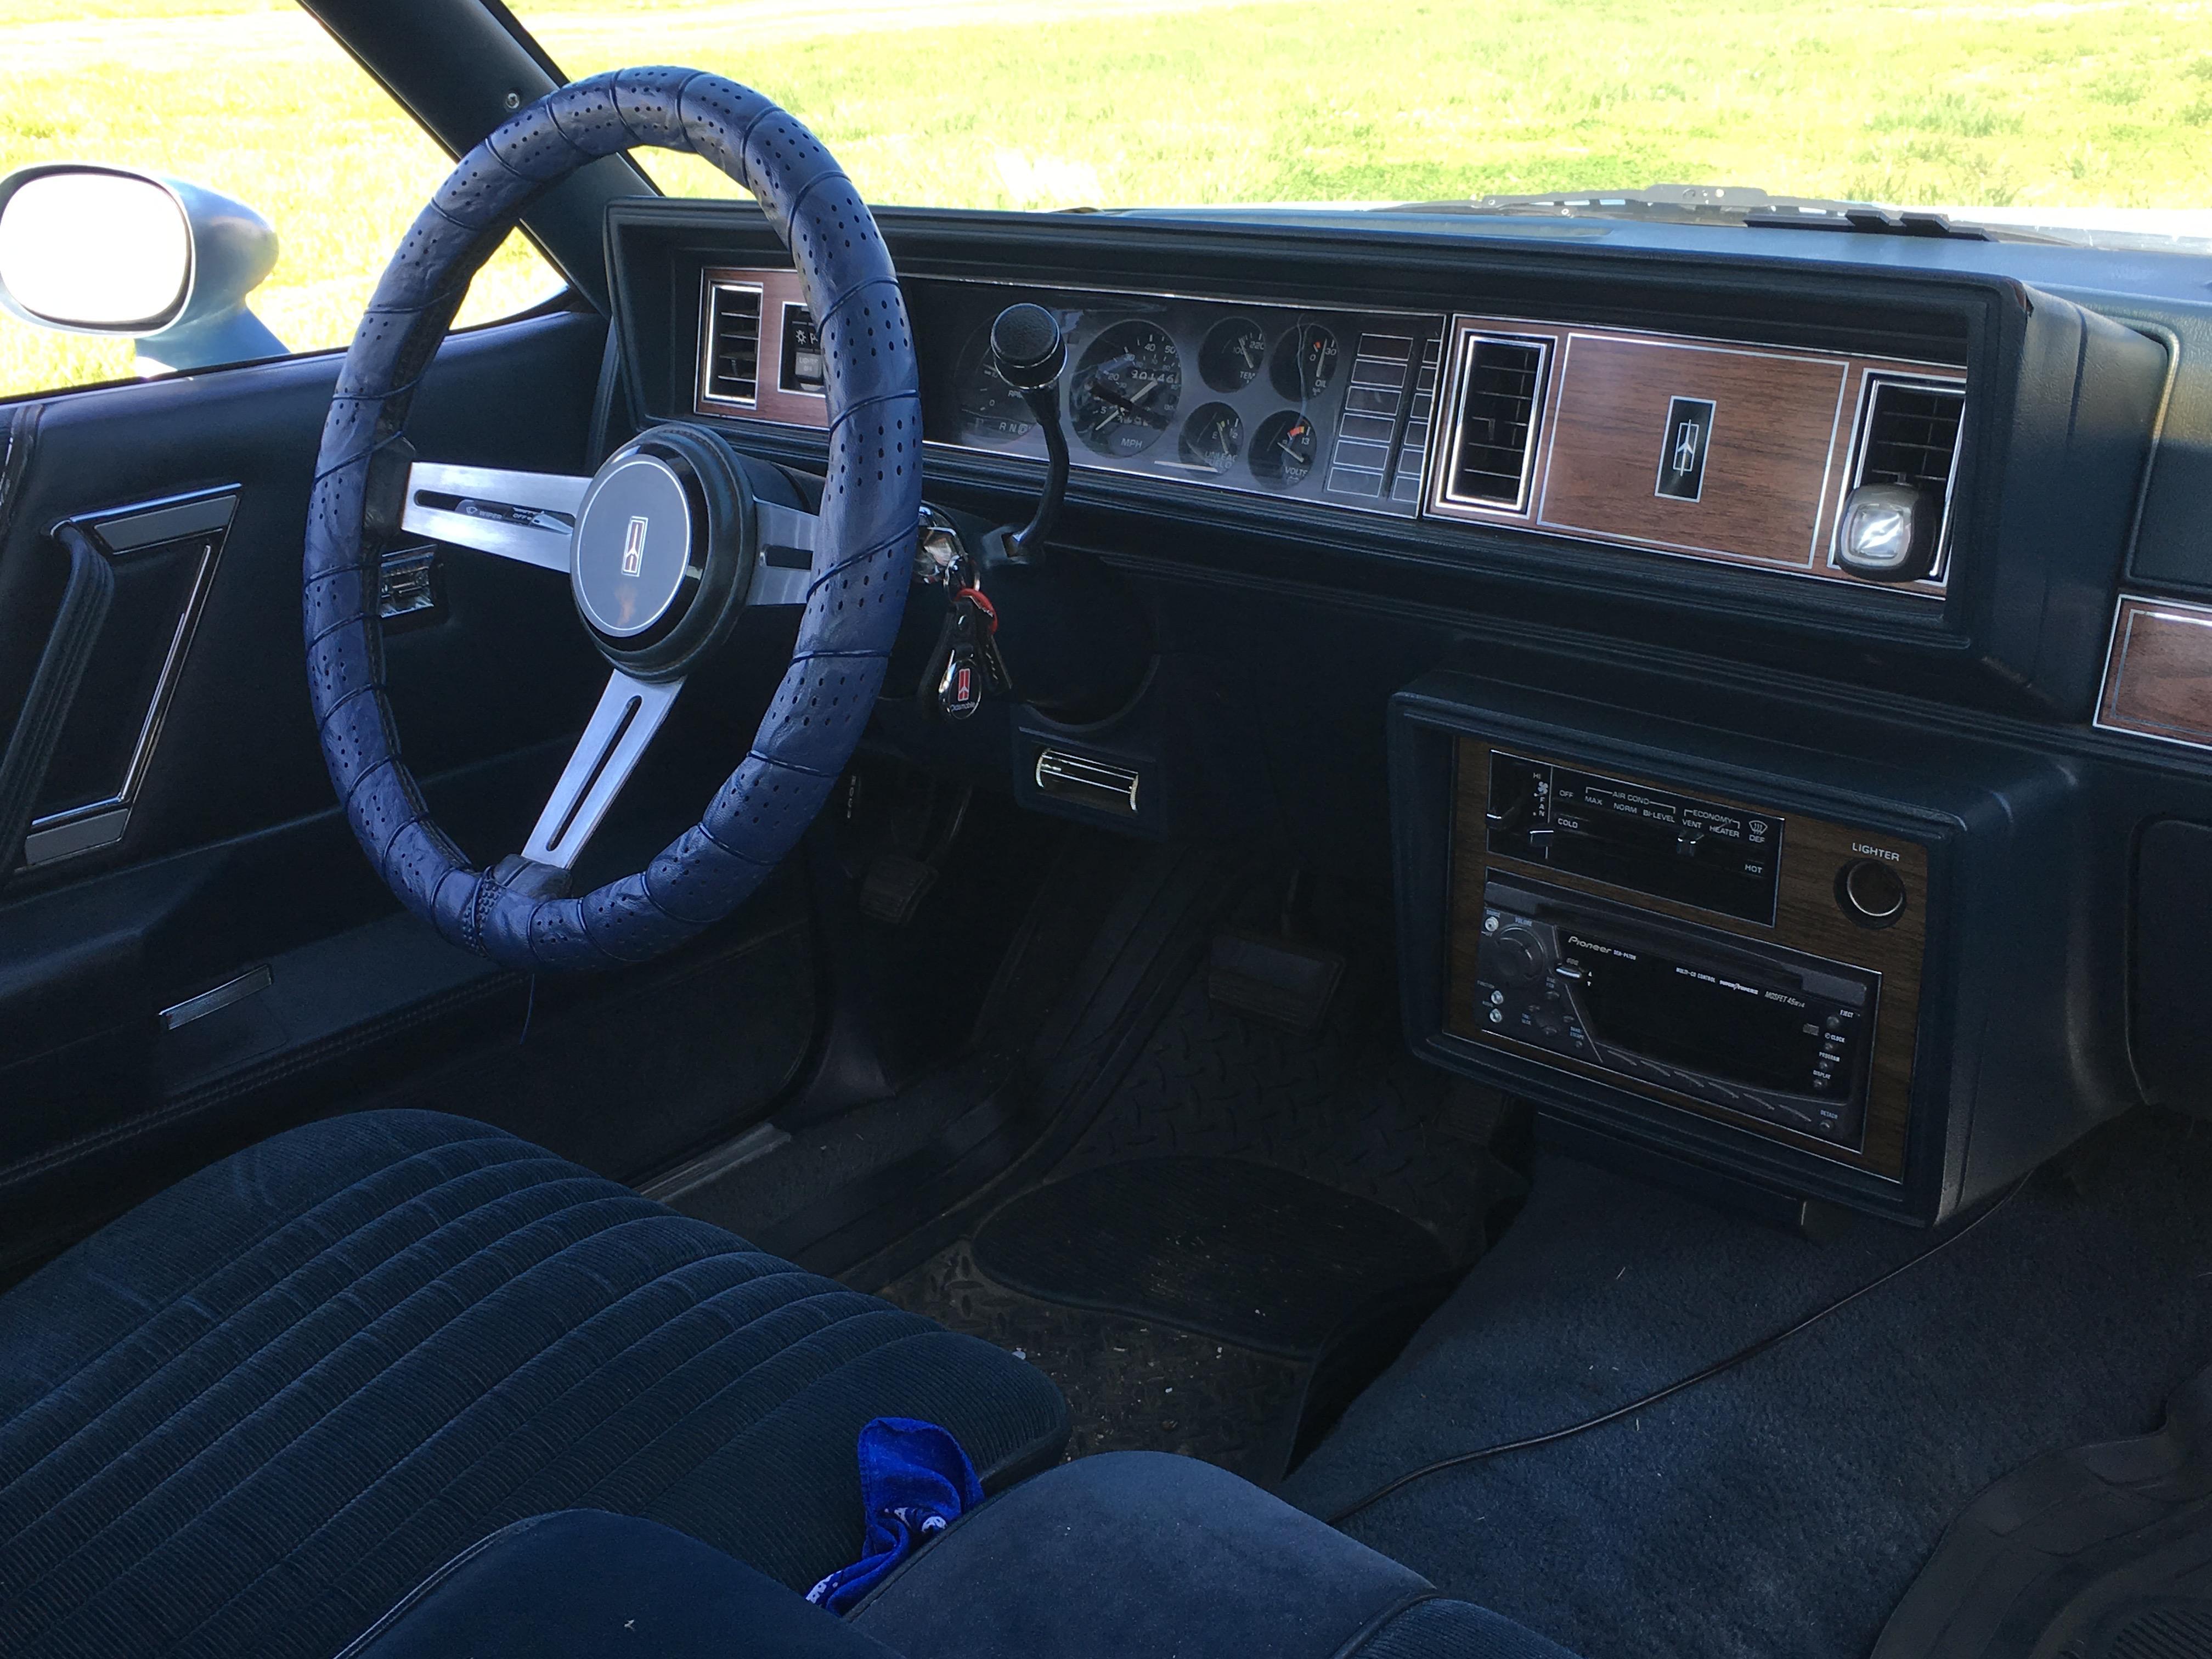 1987 Cutlass Supreme Betty Rumble Interior